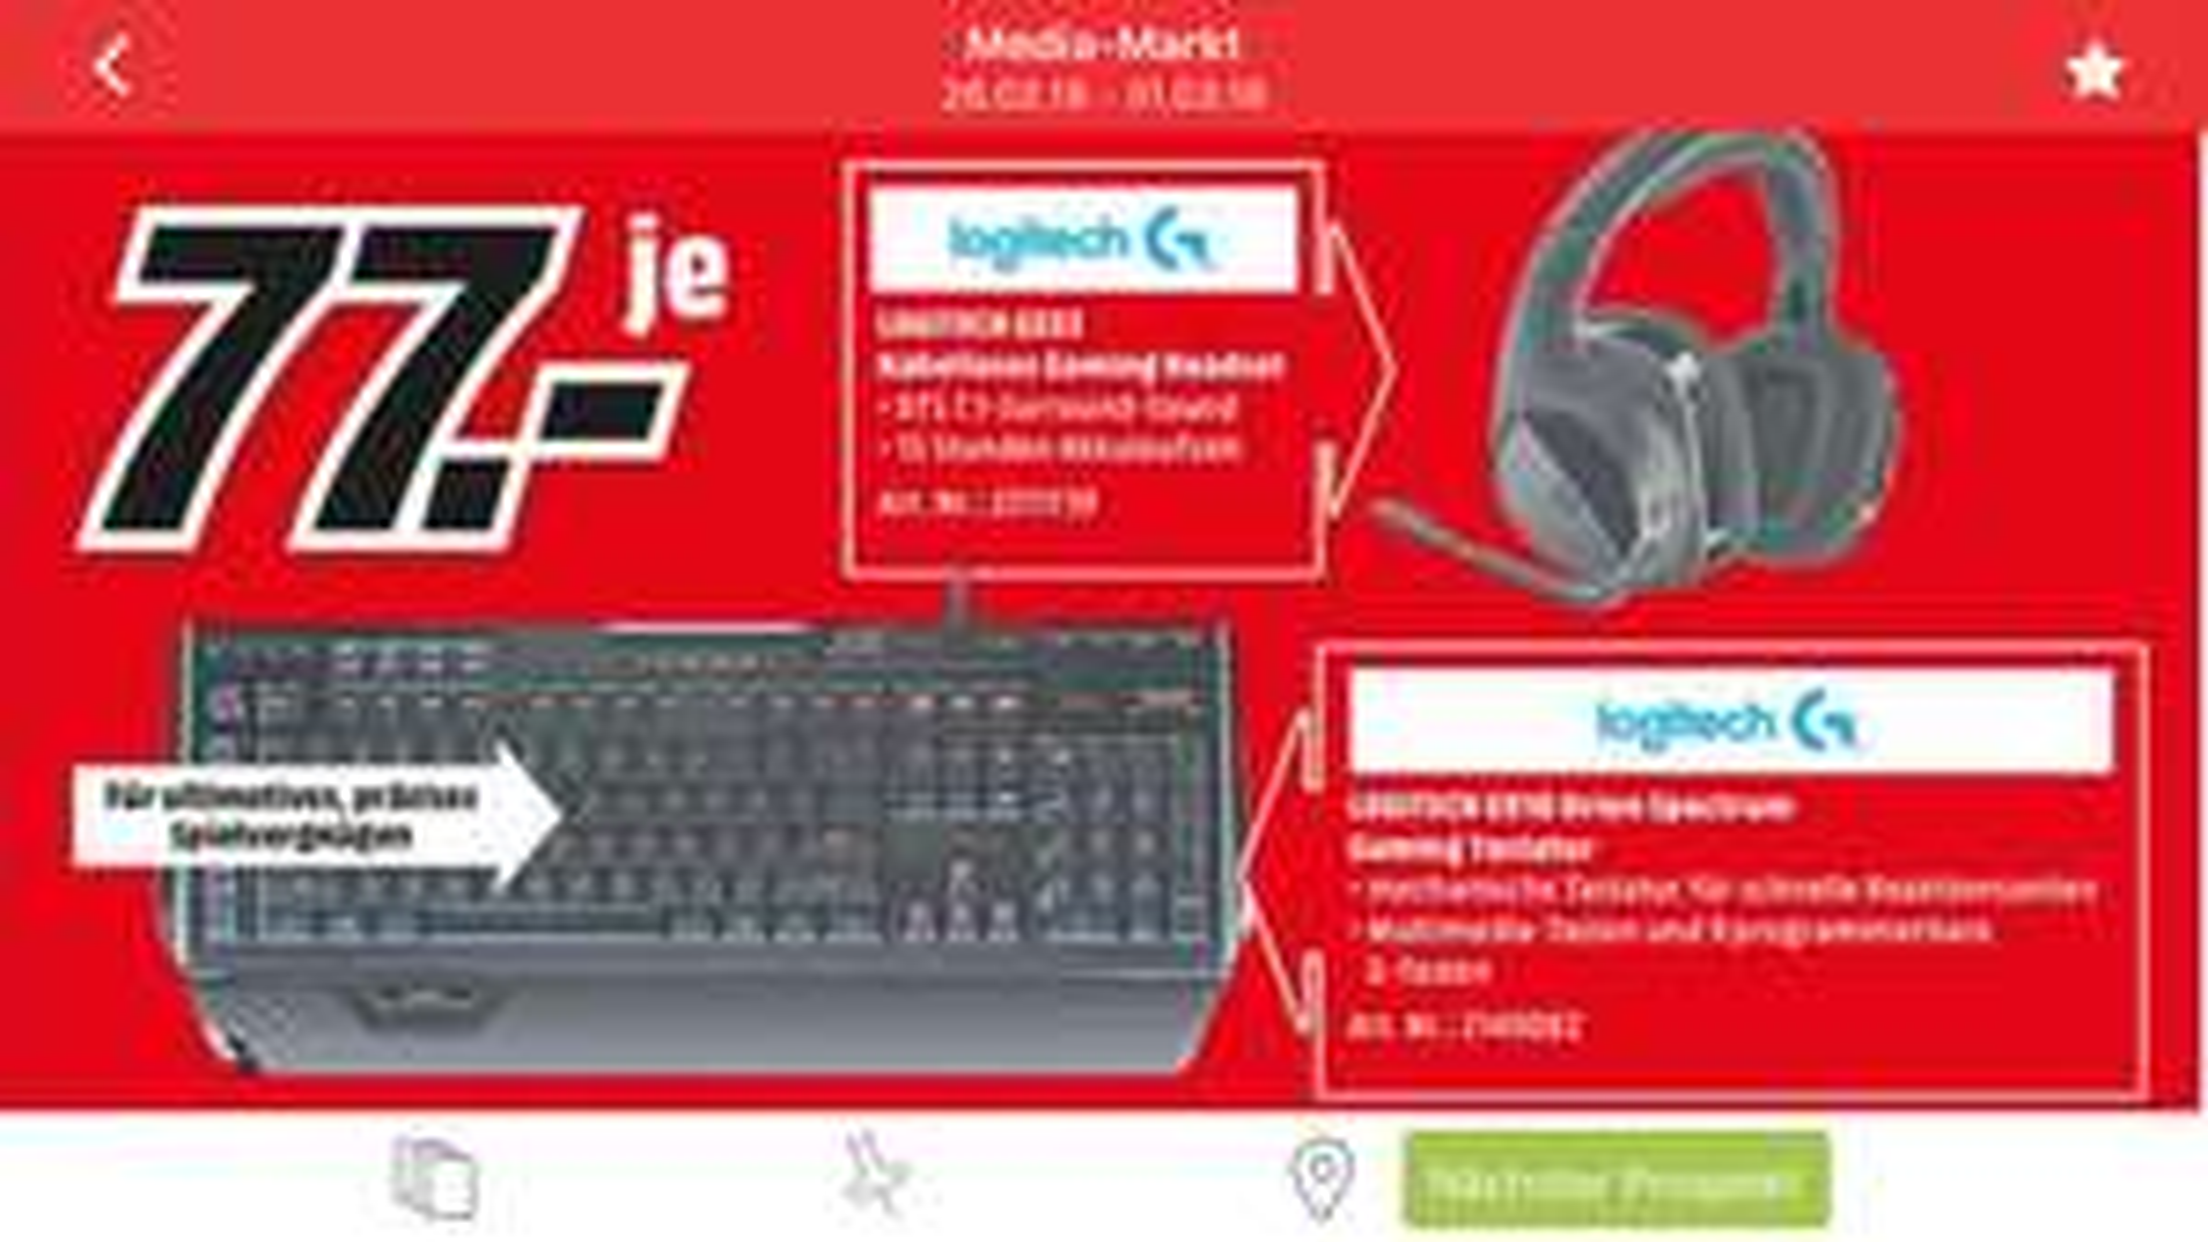 Logitech G910 Lokal MediaMarkt Berlin&Brandenburg